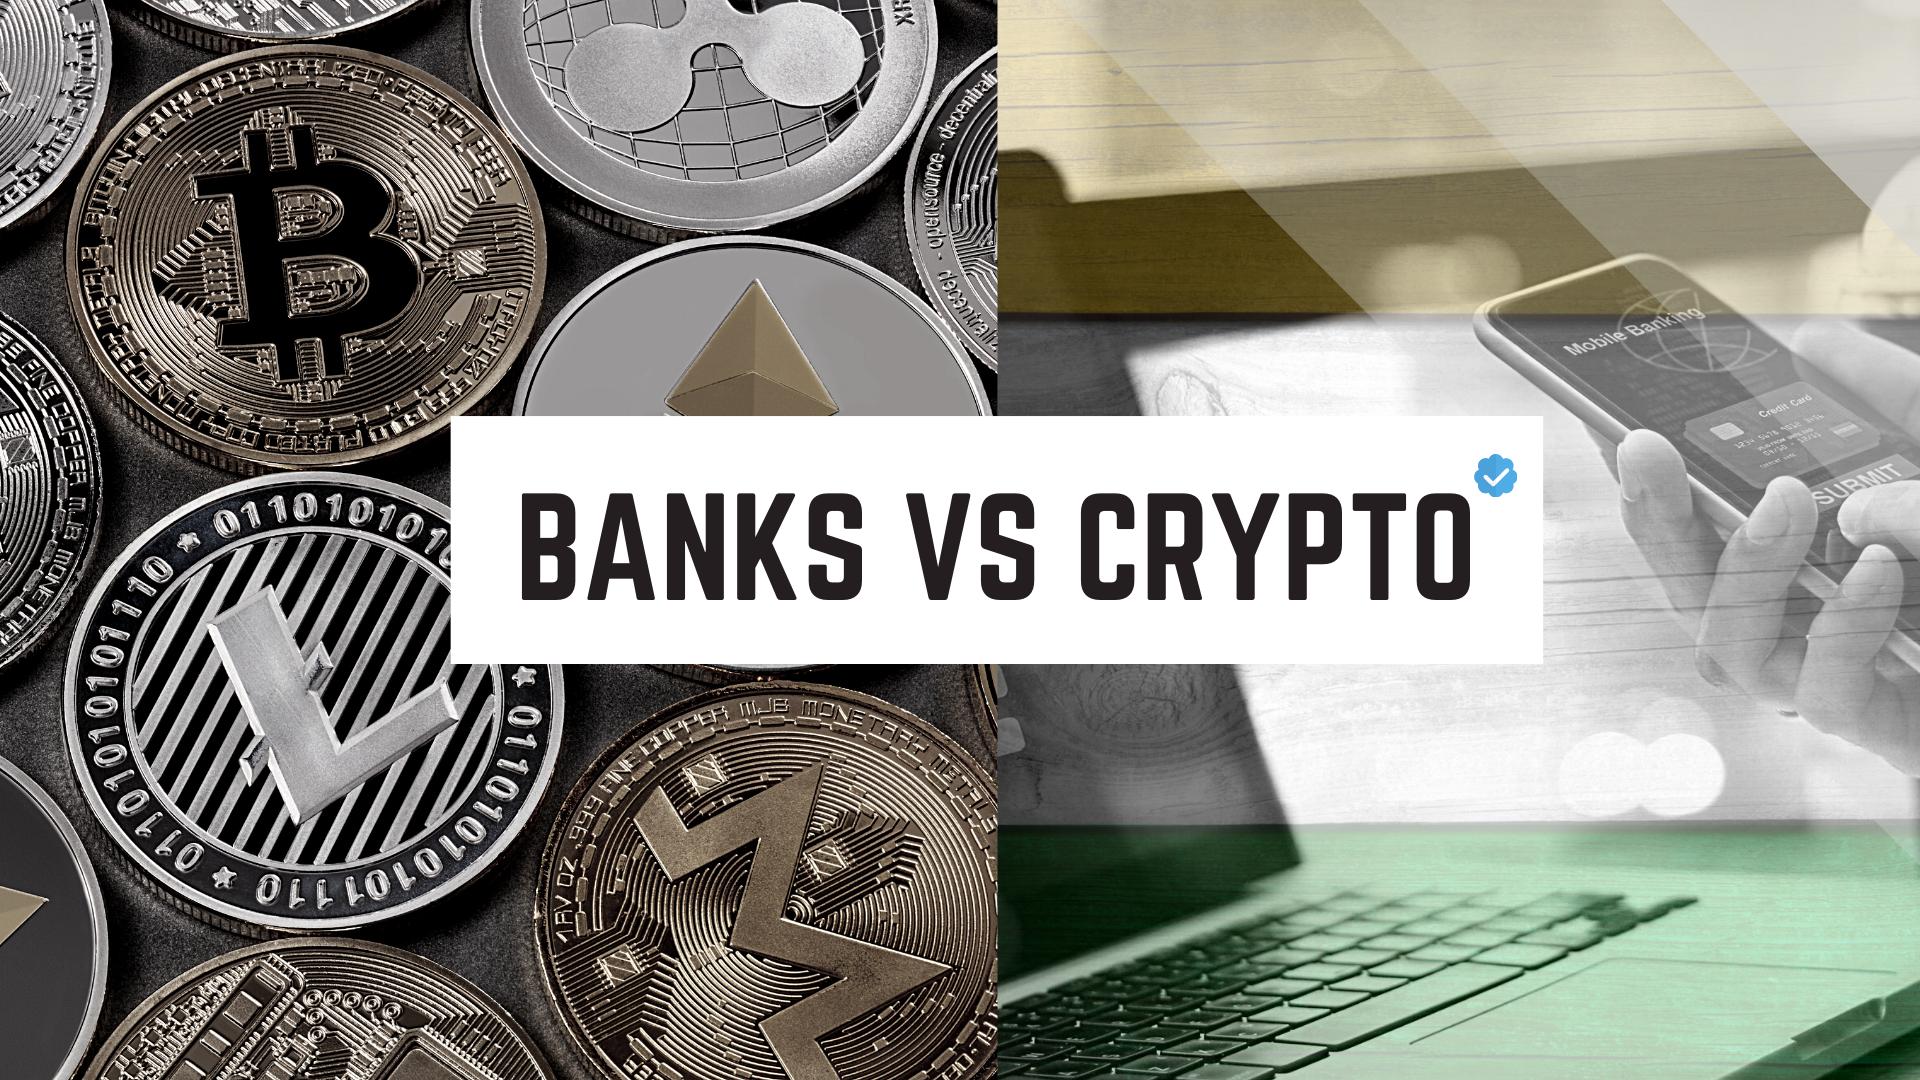 BanksVsCrypto.png